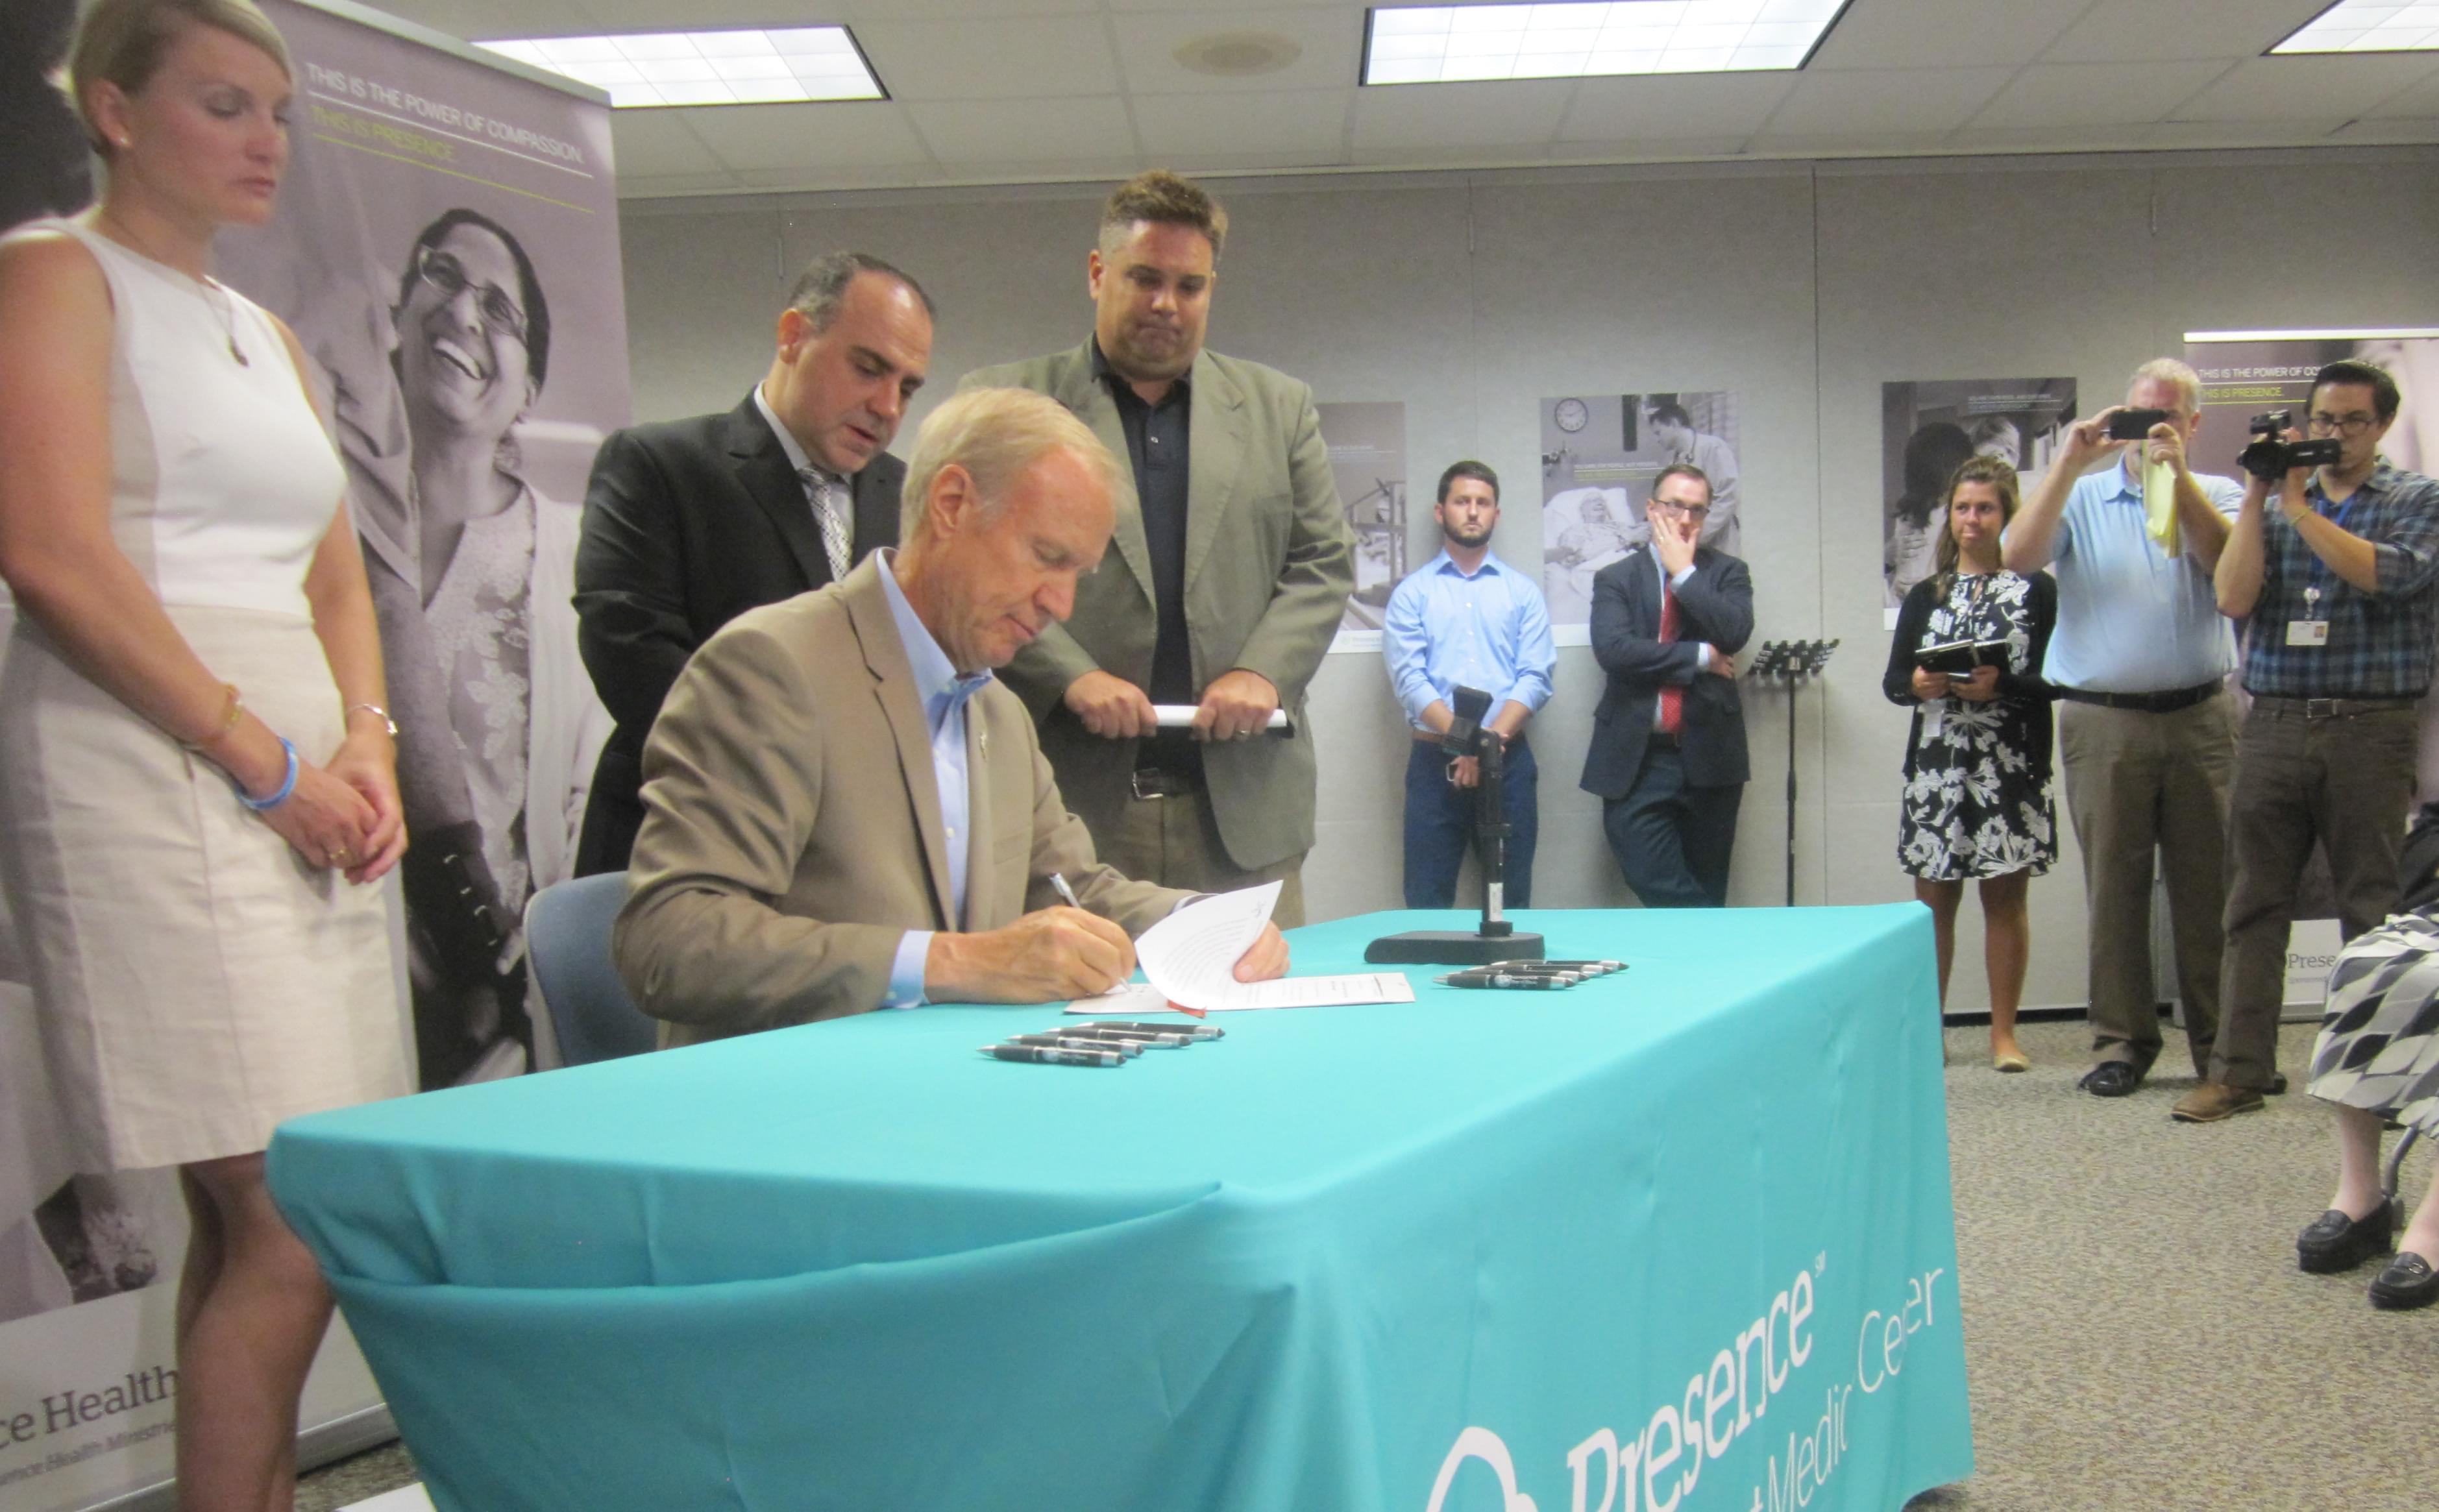 Gov. Bruce Rauner signing legislation.